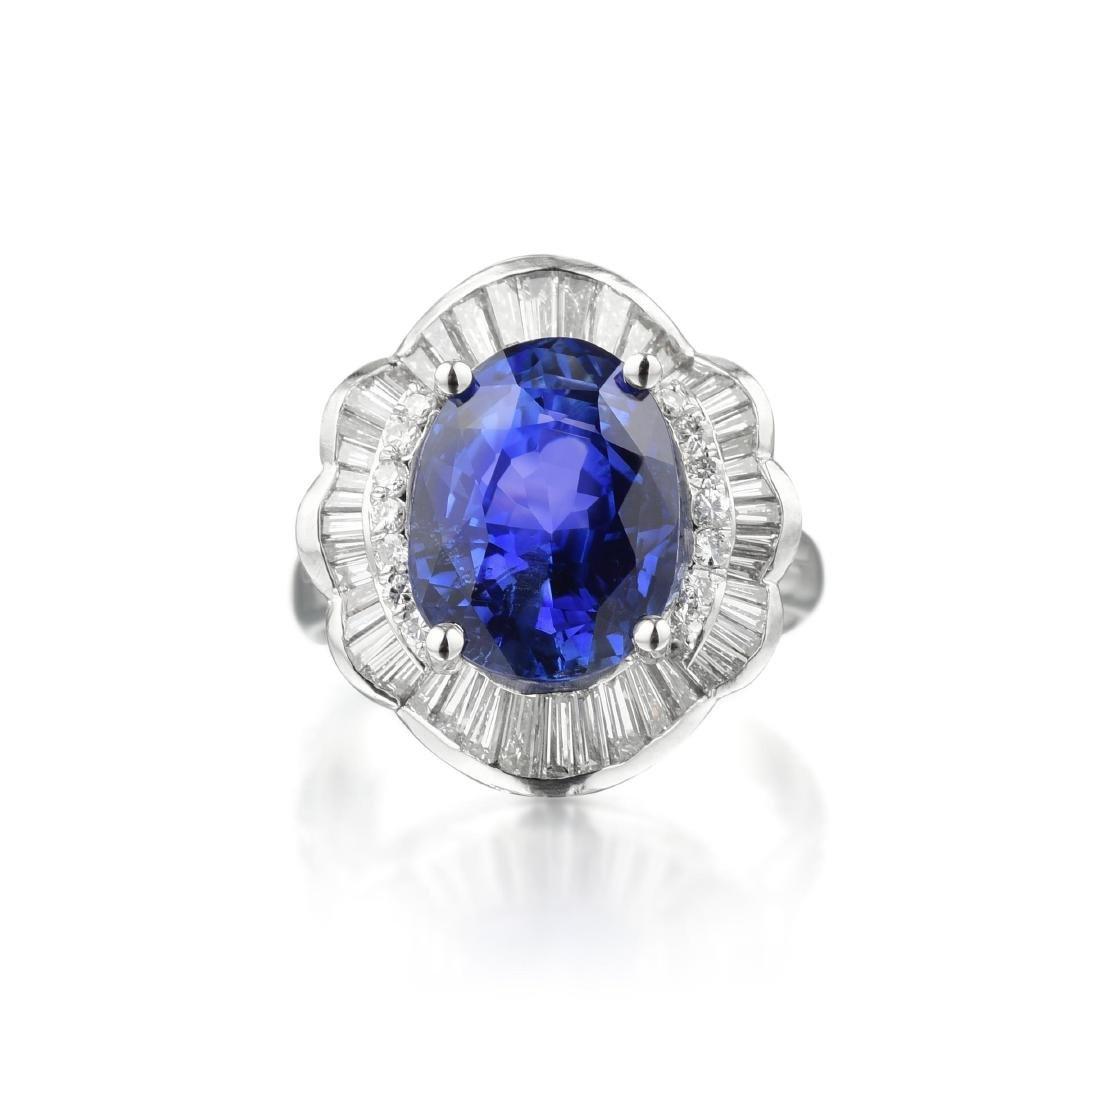 A 7.42-Carat Unheated Ceylon Sapphire and Diamond Ring